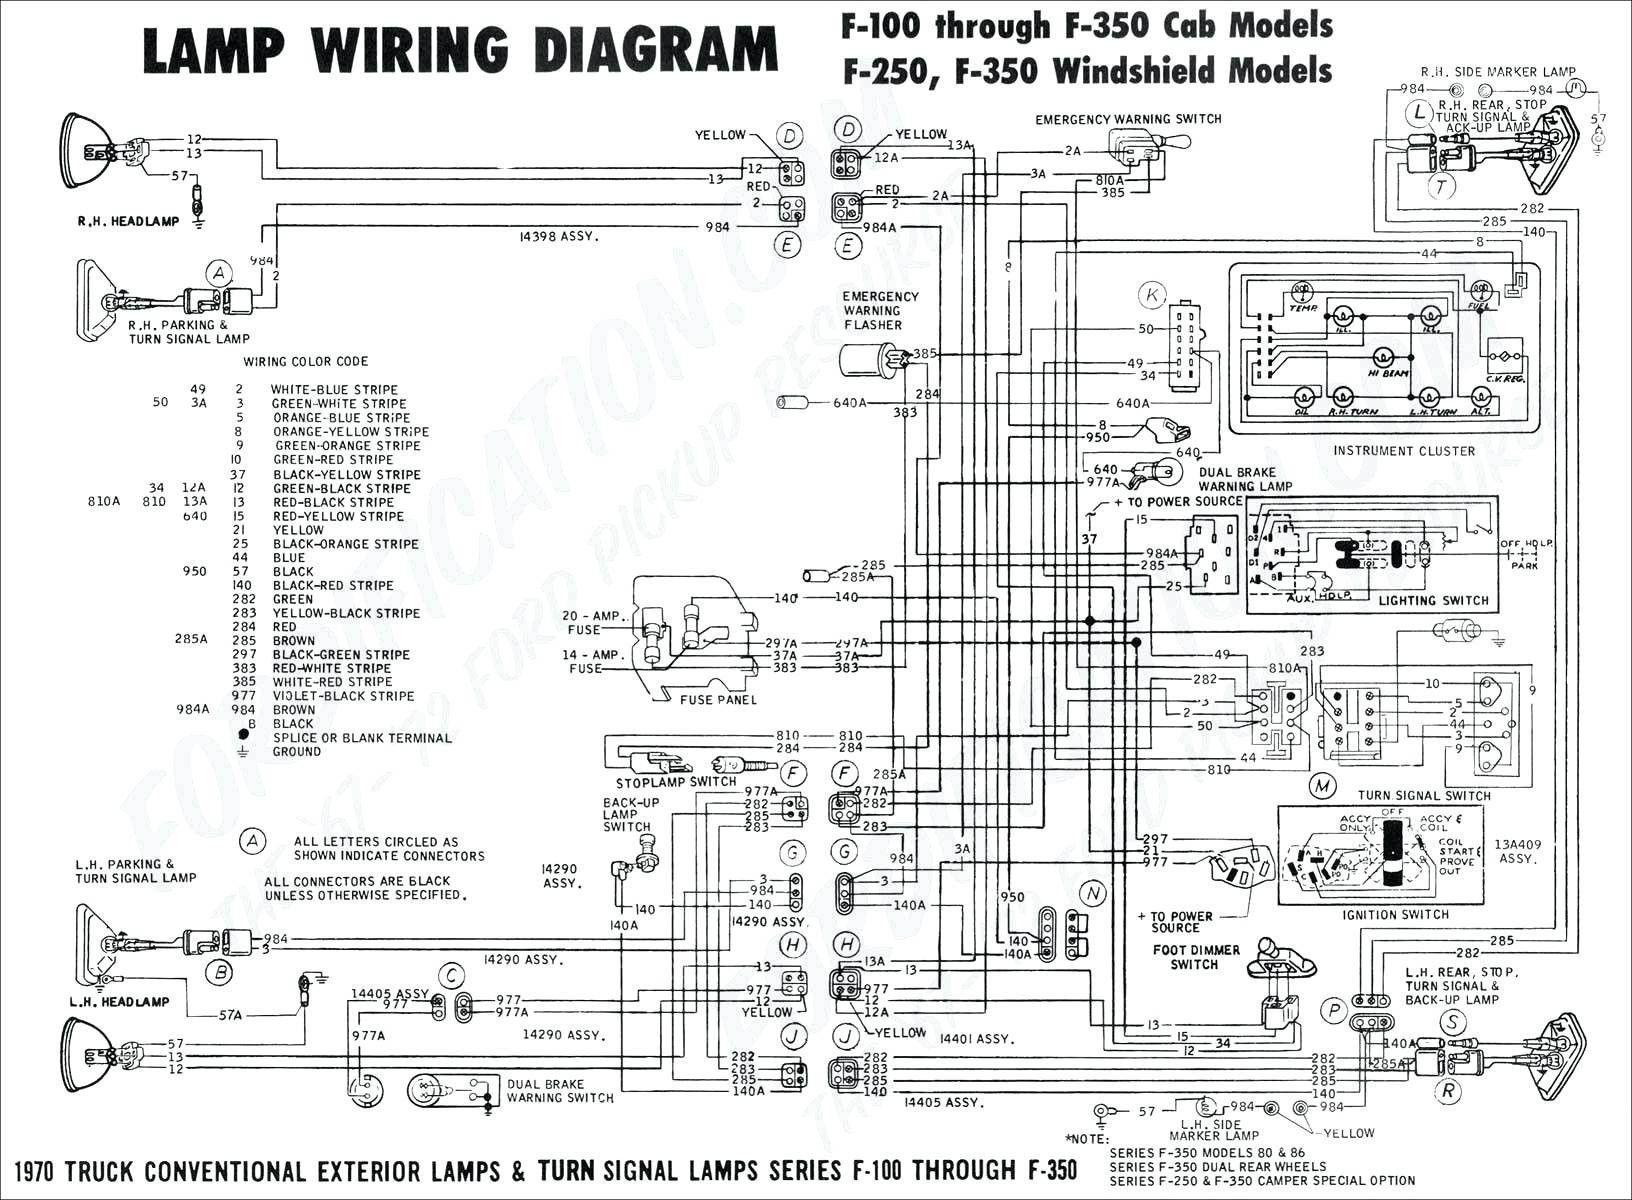 1999 Dodge Caravan Engine Diagram Di 2020 Nissan Maxima Ford Explorer Honda Accord